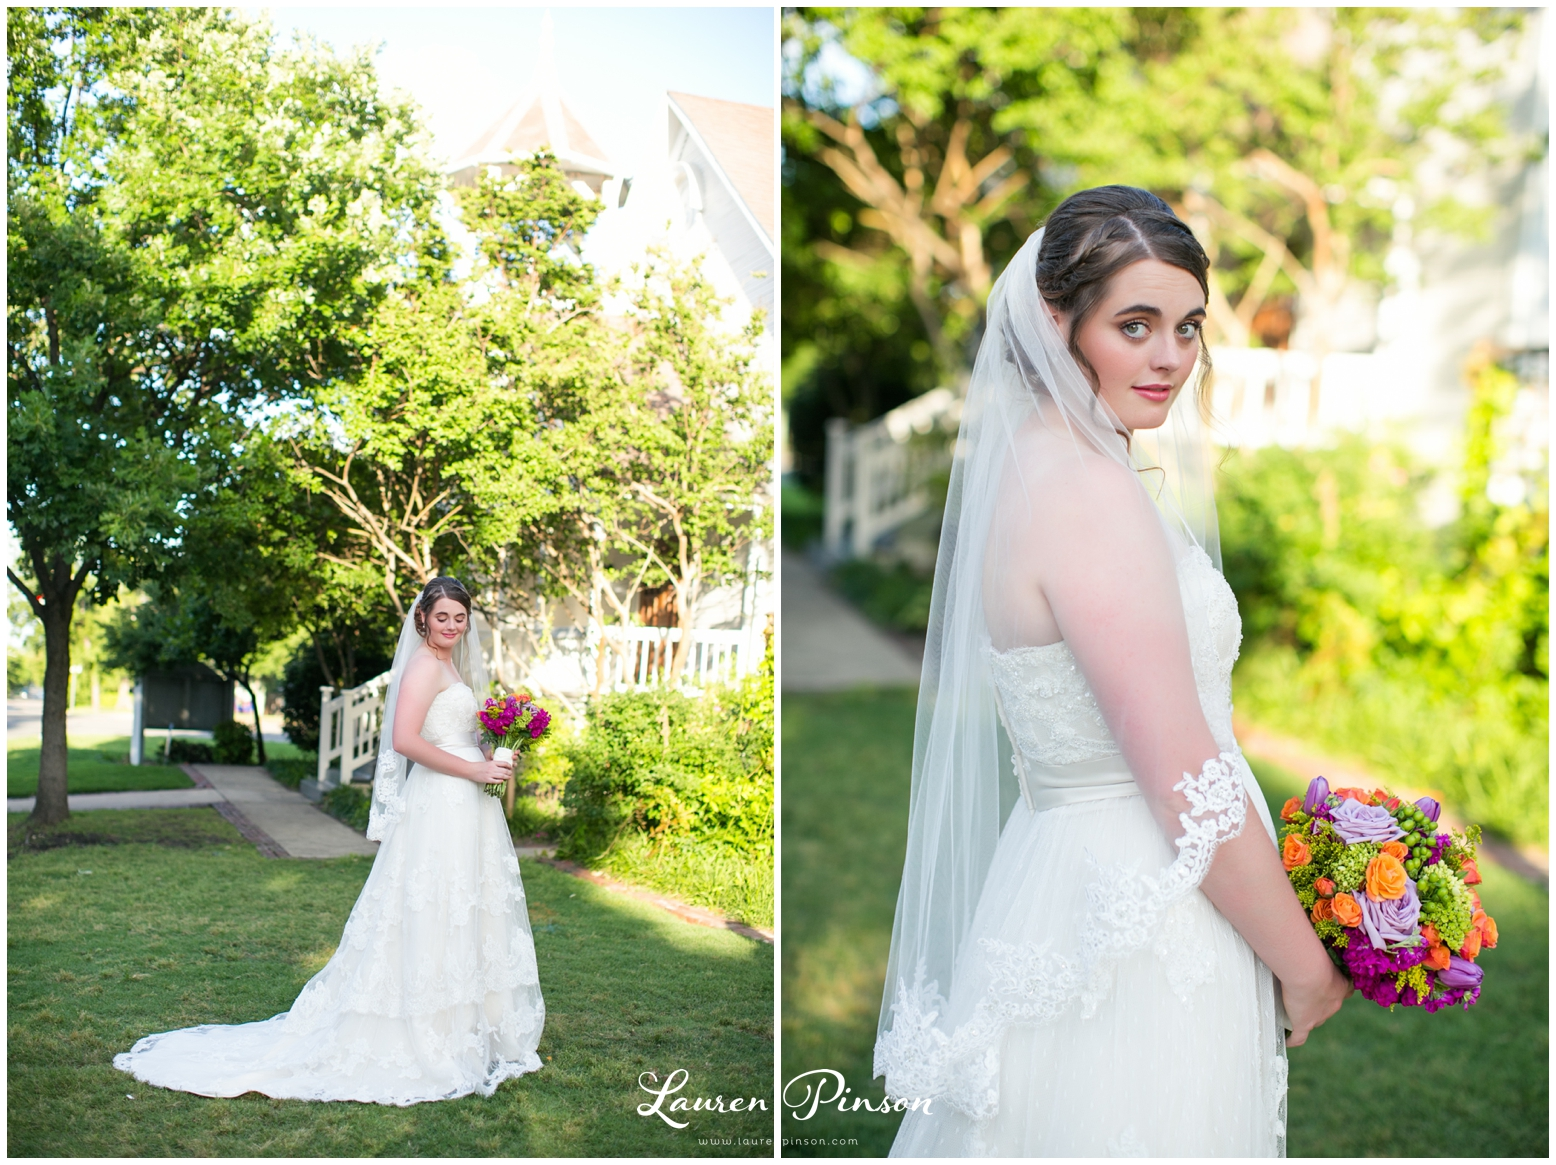 chestnut-square-downtown-mckinney-texas-wedding-photographer-sherman-northtexas-bridal-portraits-photography_0217.jpg